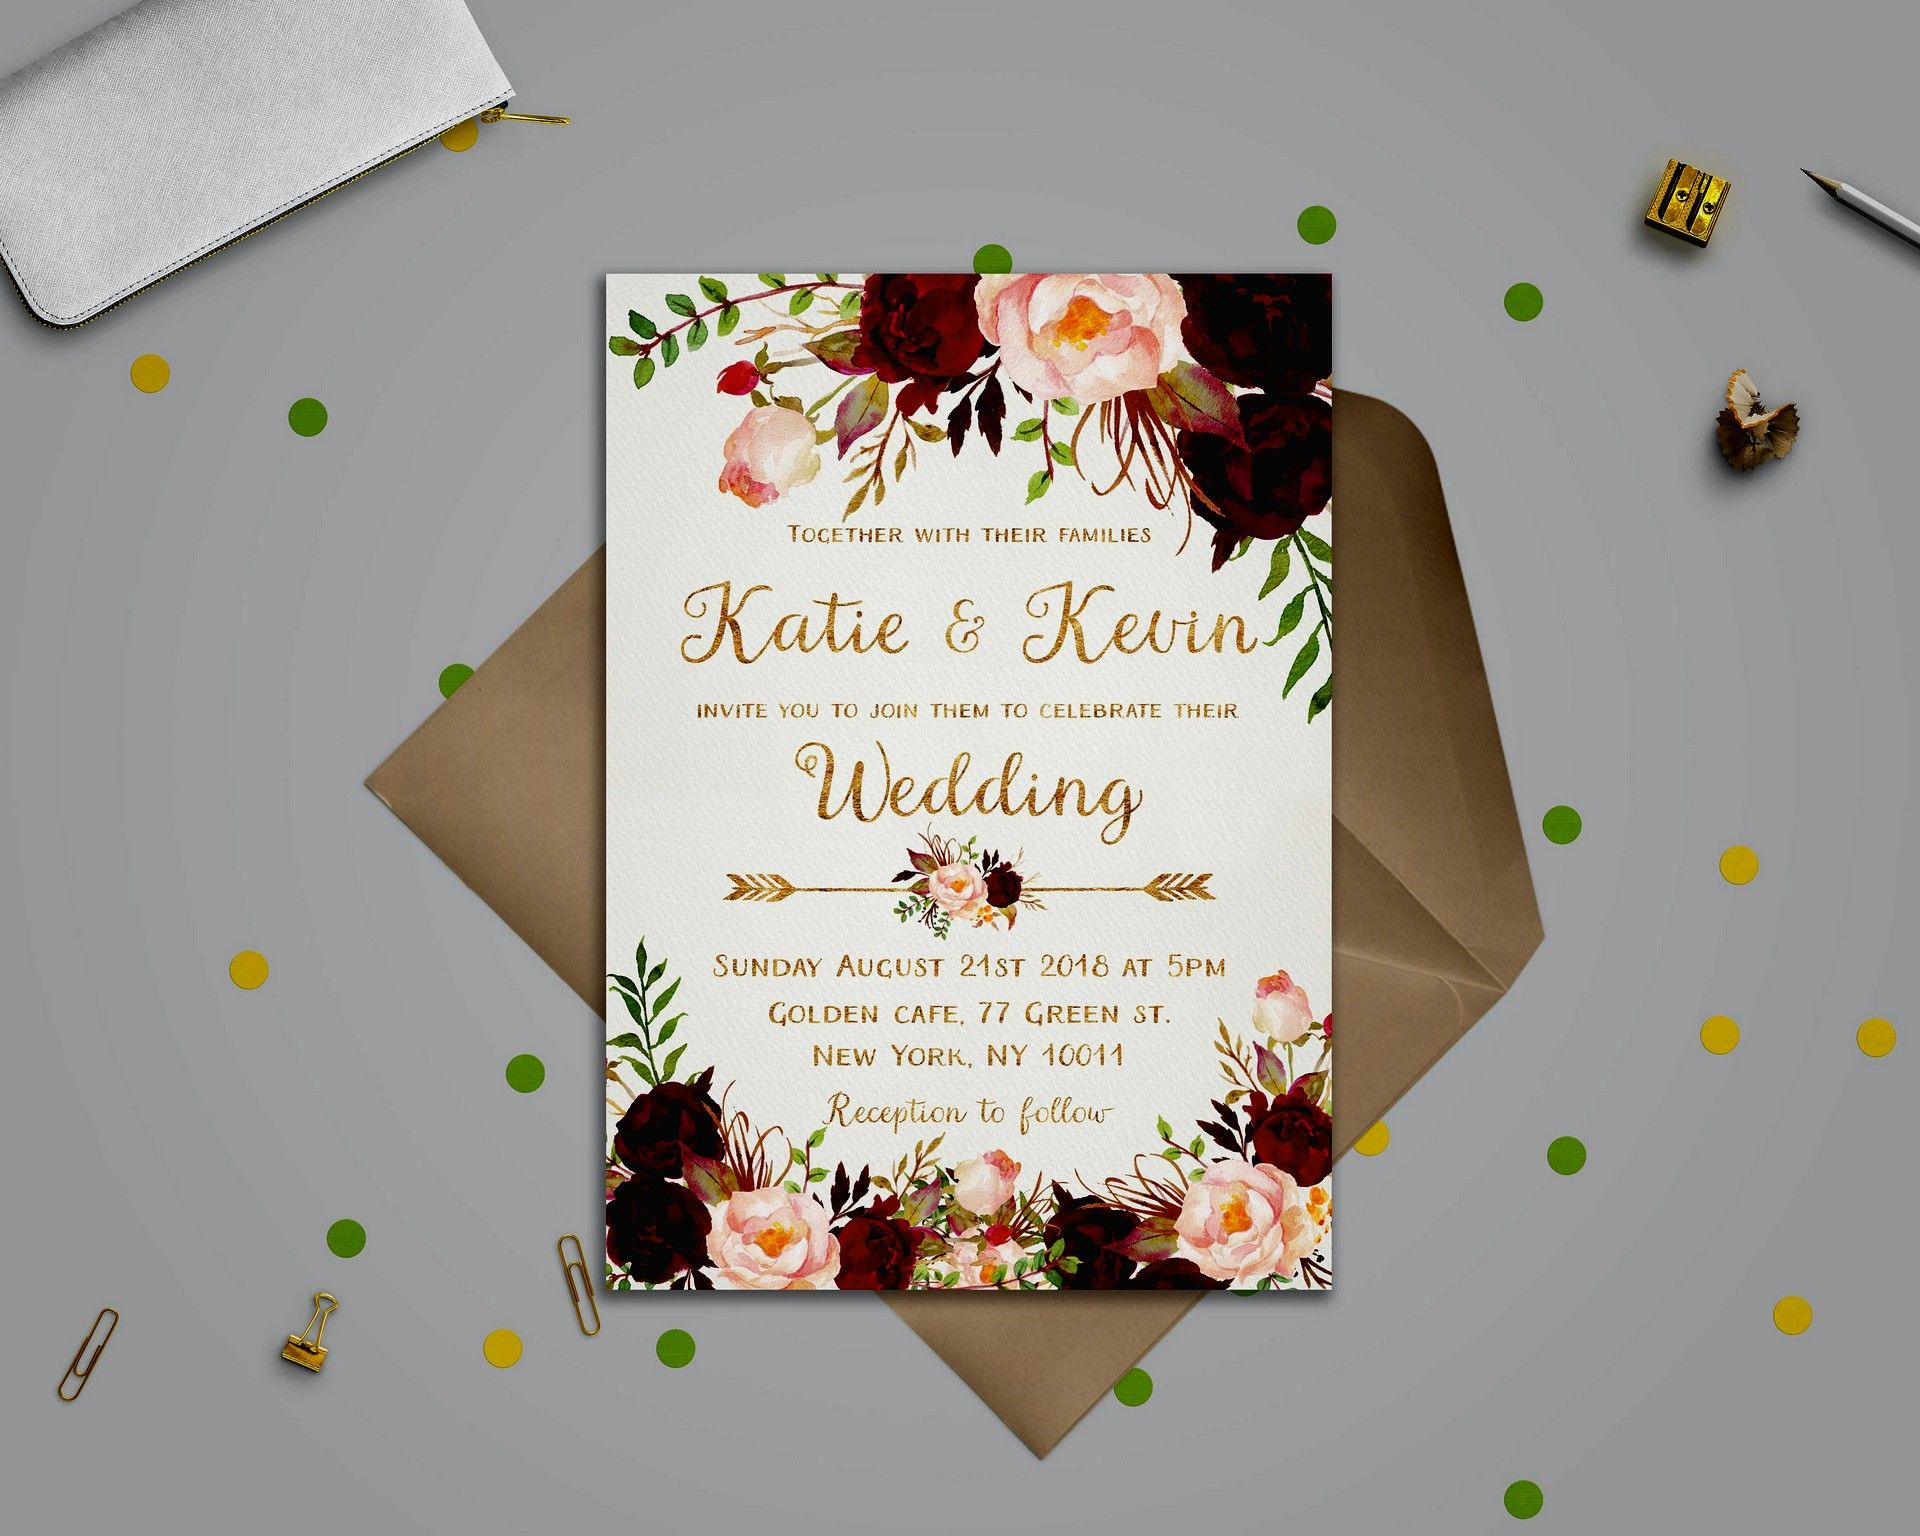 Creative Wedding Invitation Card Design Ideas In 2020 Etsy Wedding Invitations Free Wedding Invitation Templates Floral Wedding Invitations